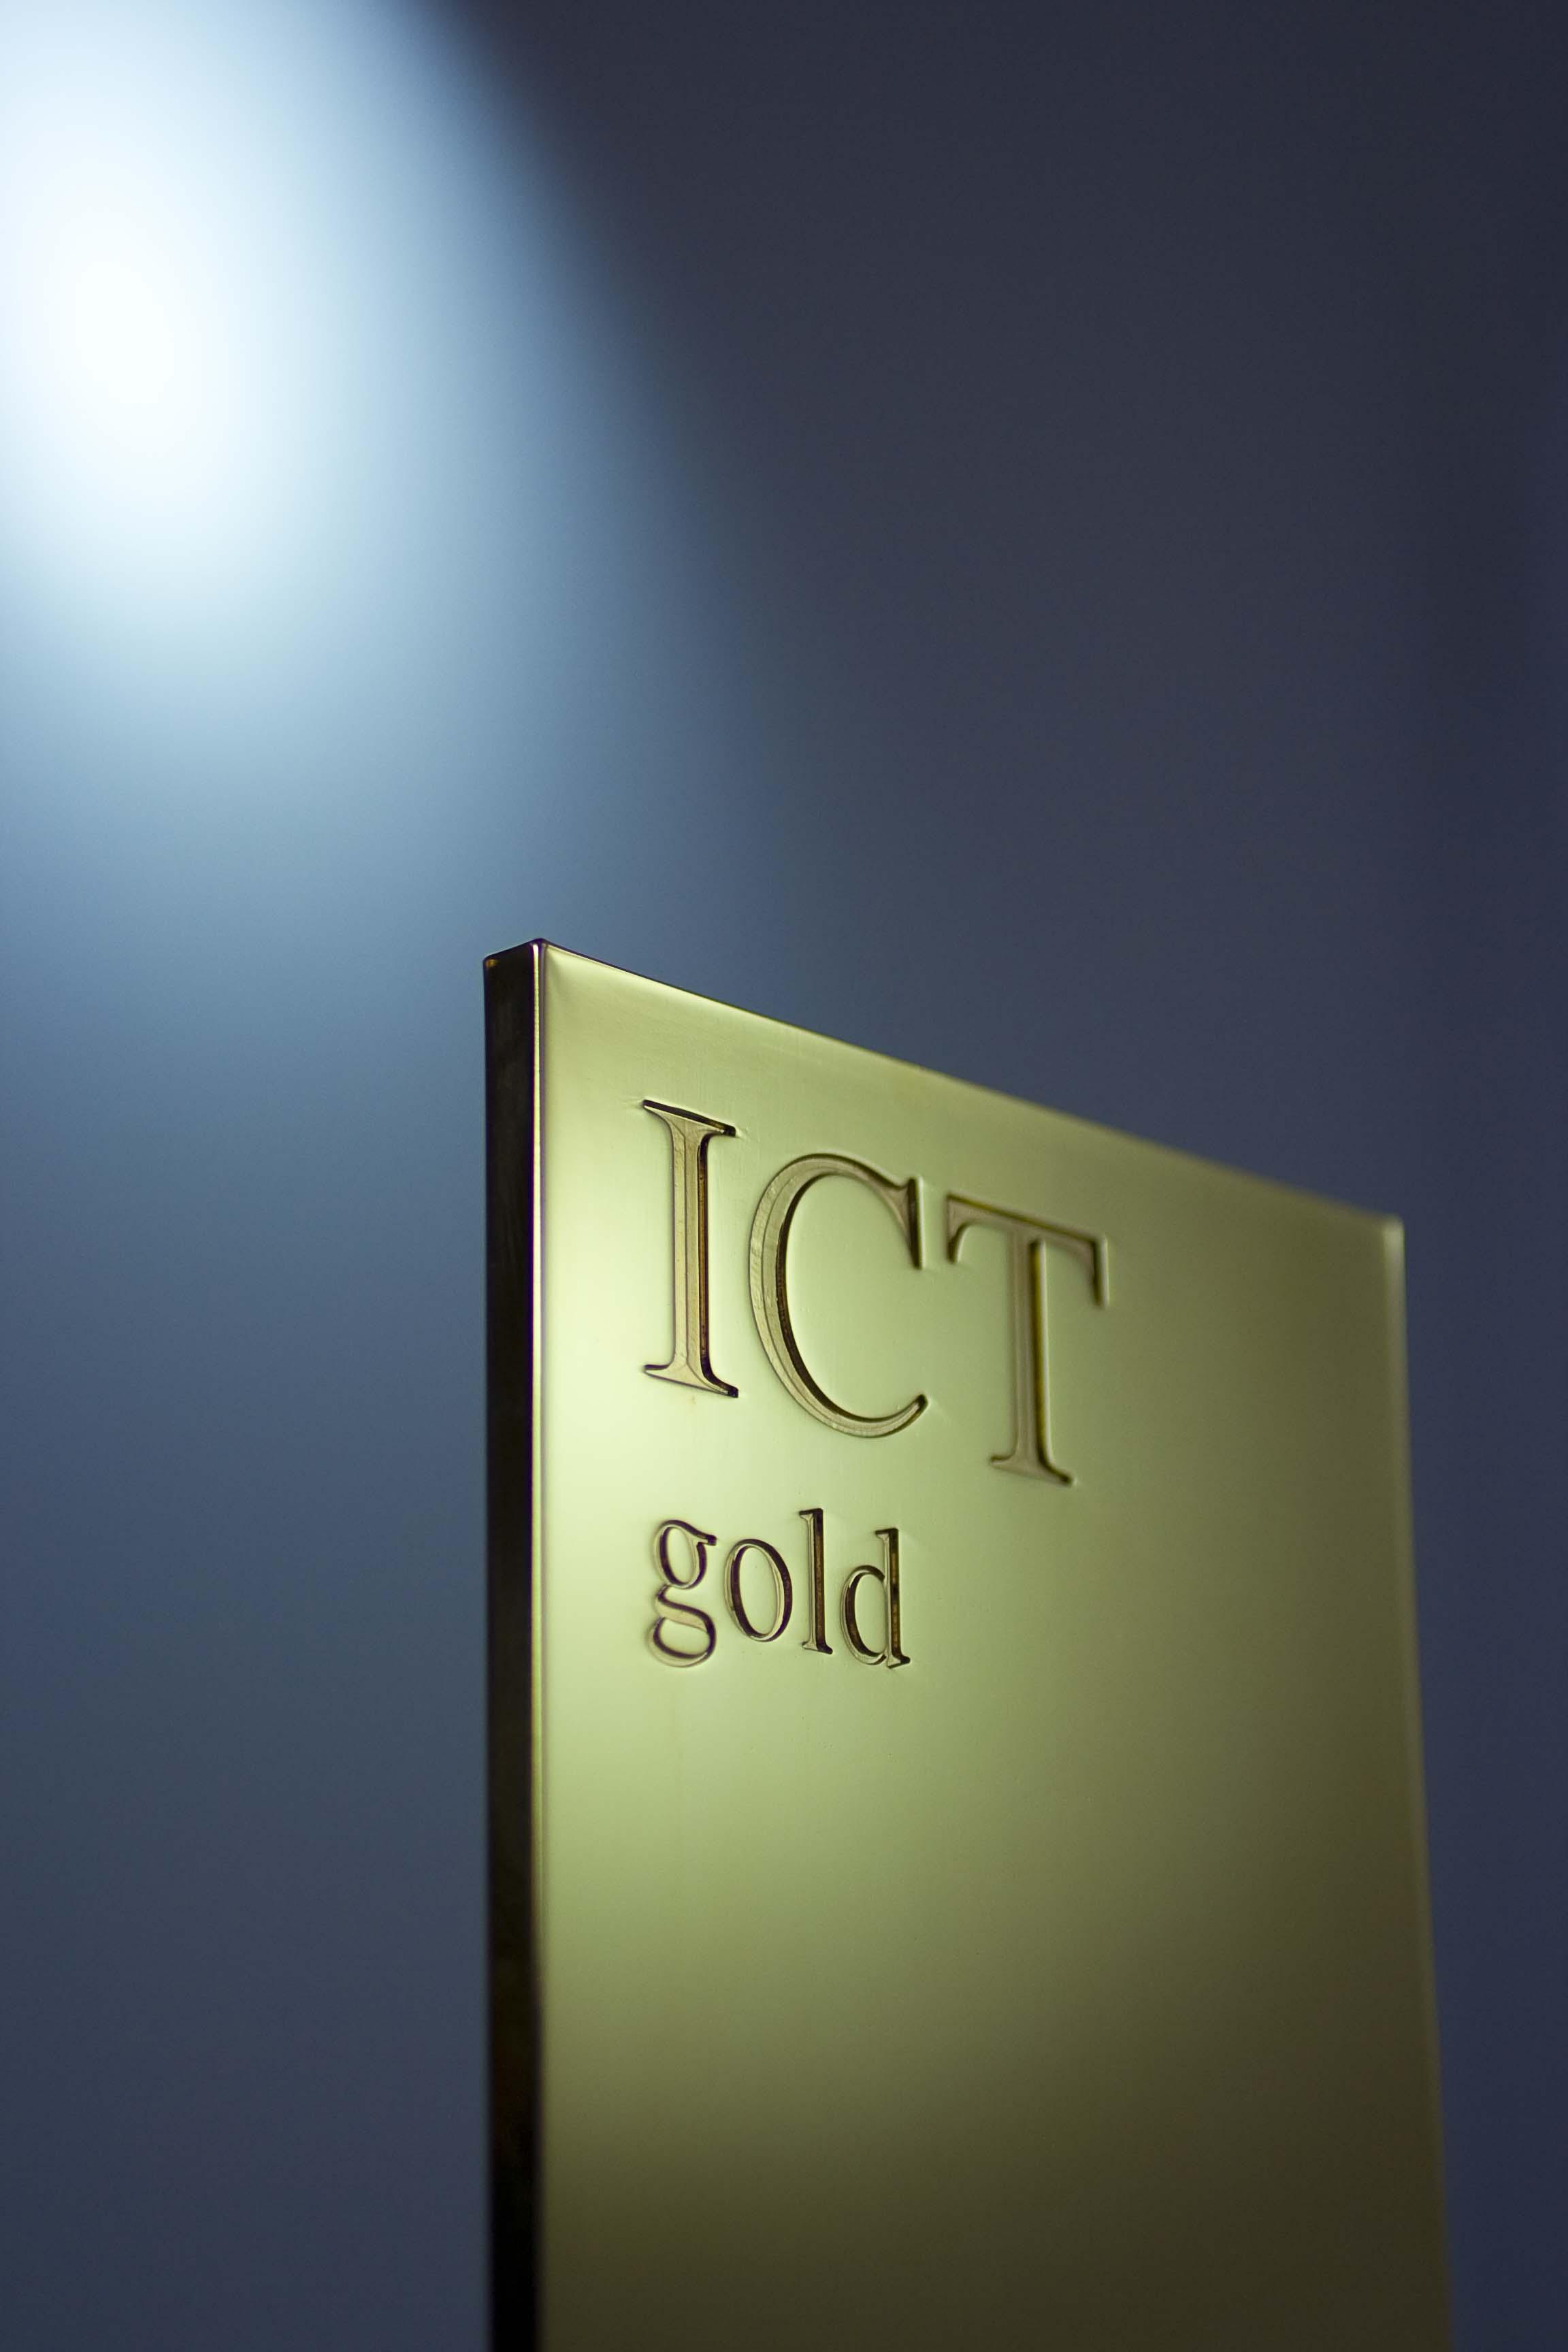 ICT Gold nagrada 5.jpg